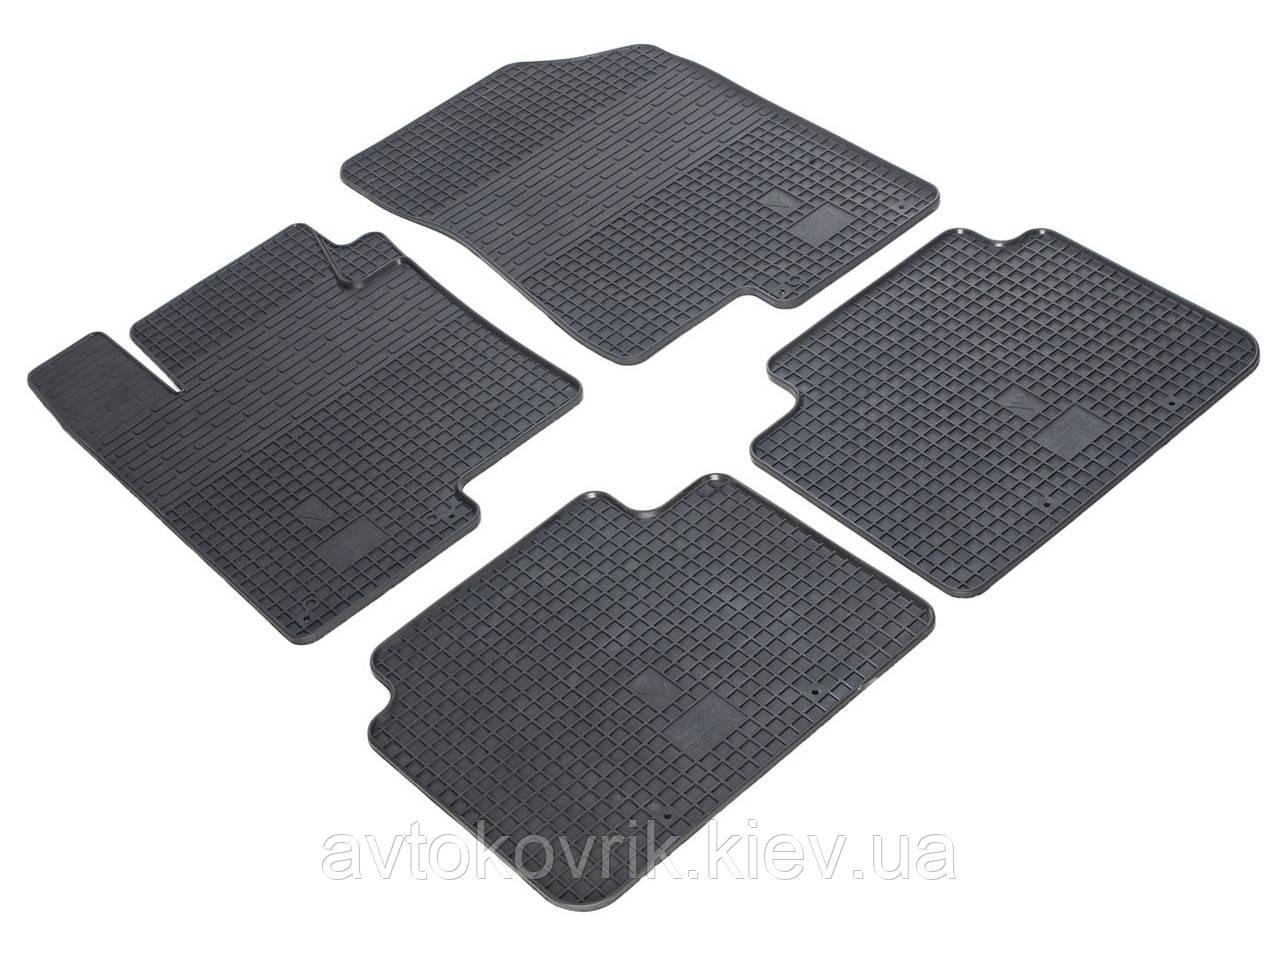 Резиновые коврики в салон Kia Optima III (TF) 2010-2015 (STINGRAY)